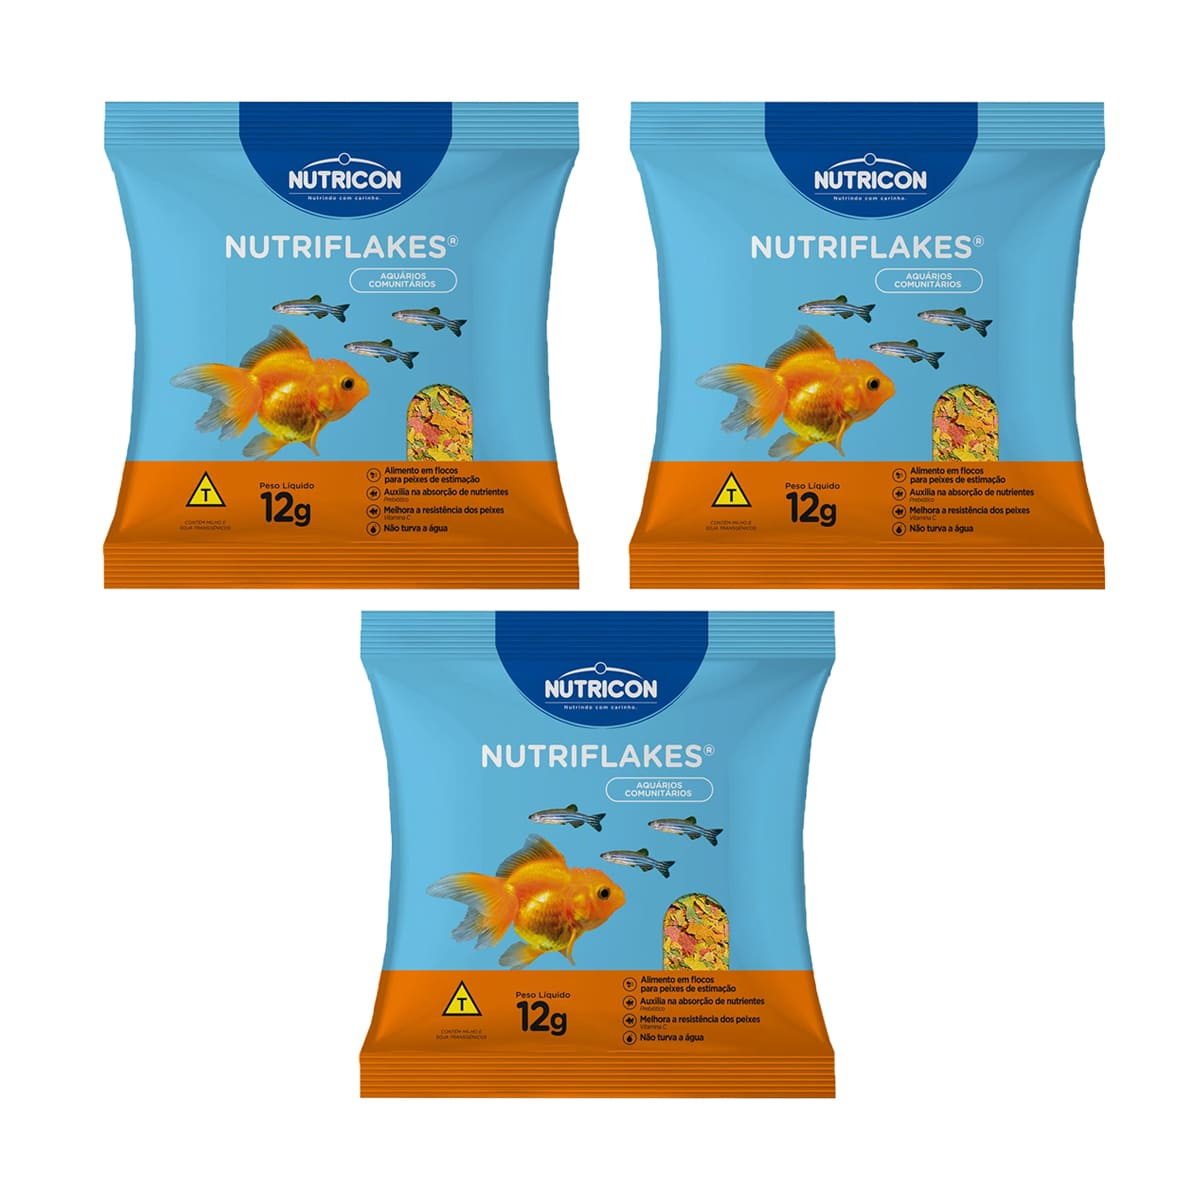 Kit Ração Nutricon Flocos Nutriflakes - 12g  (3 Unidades)